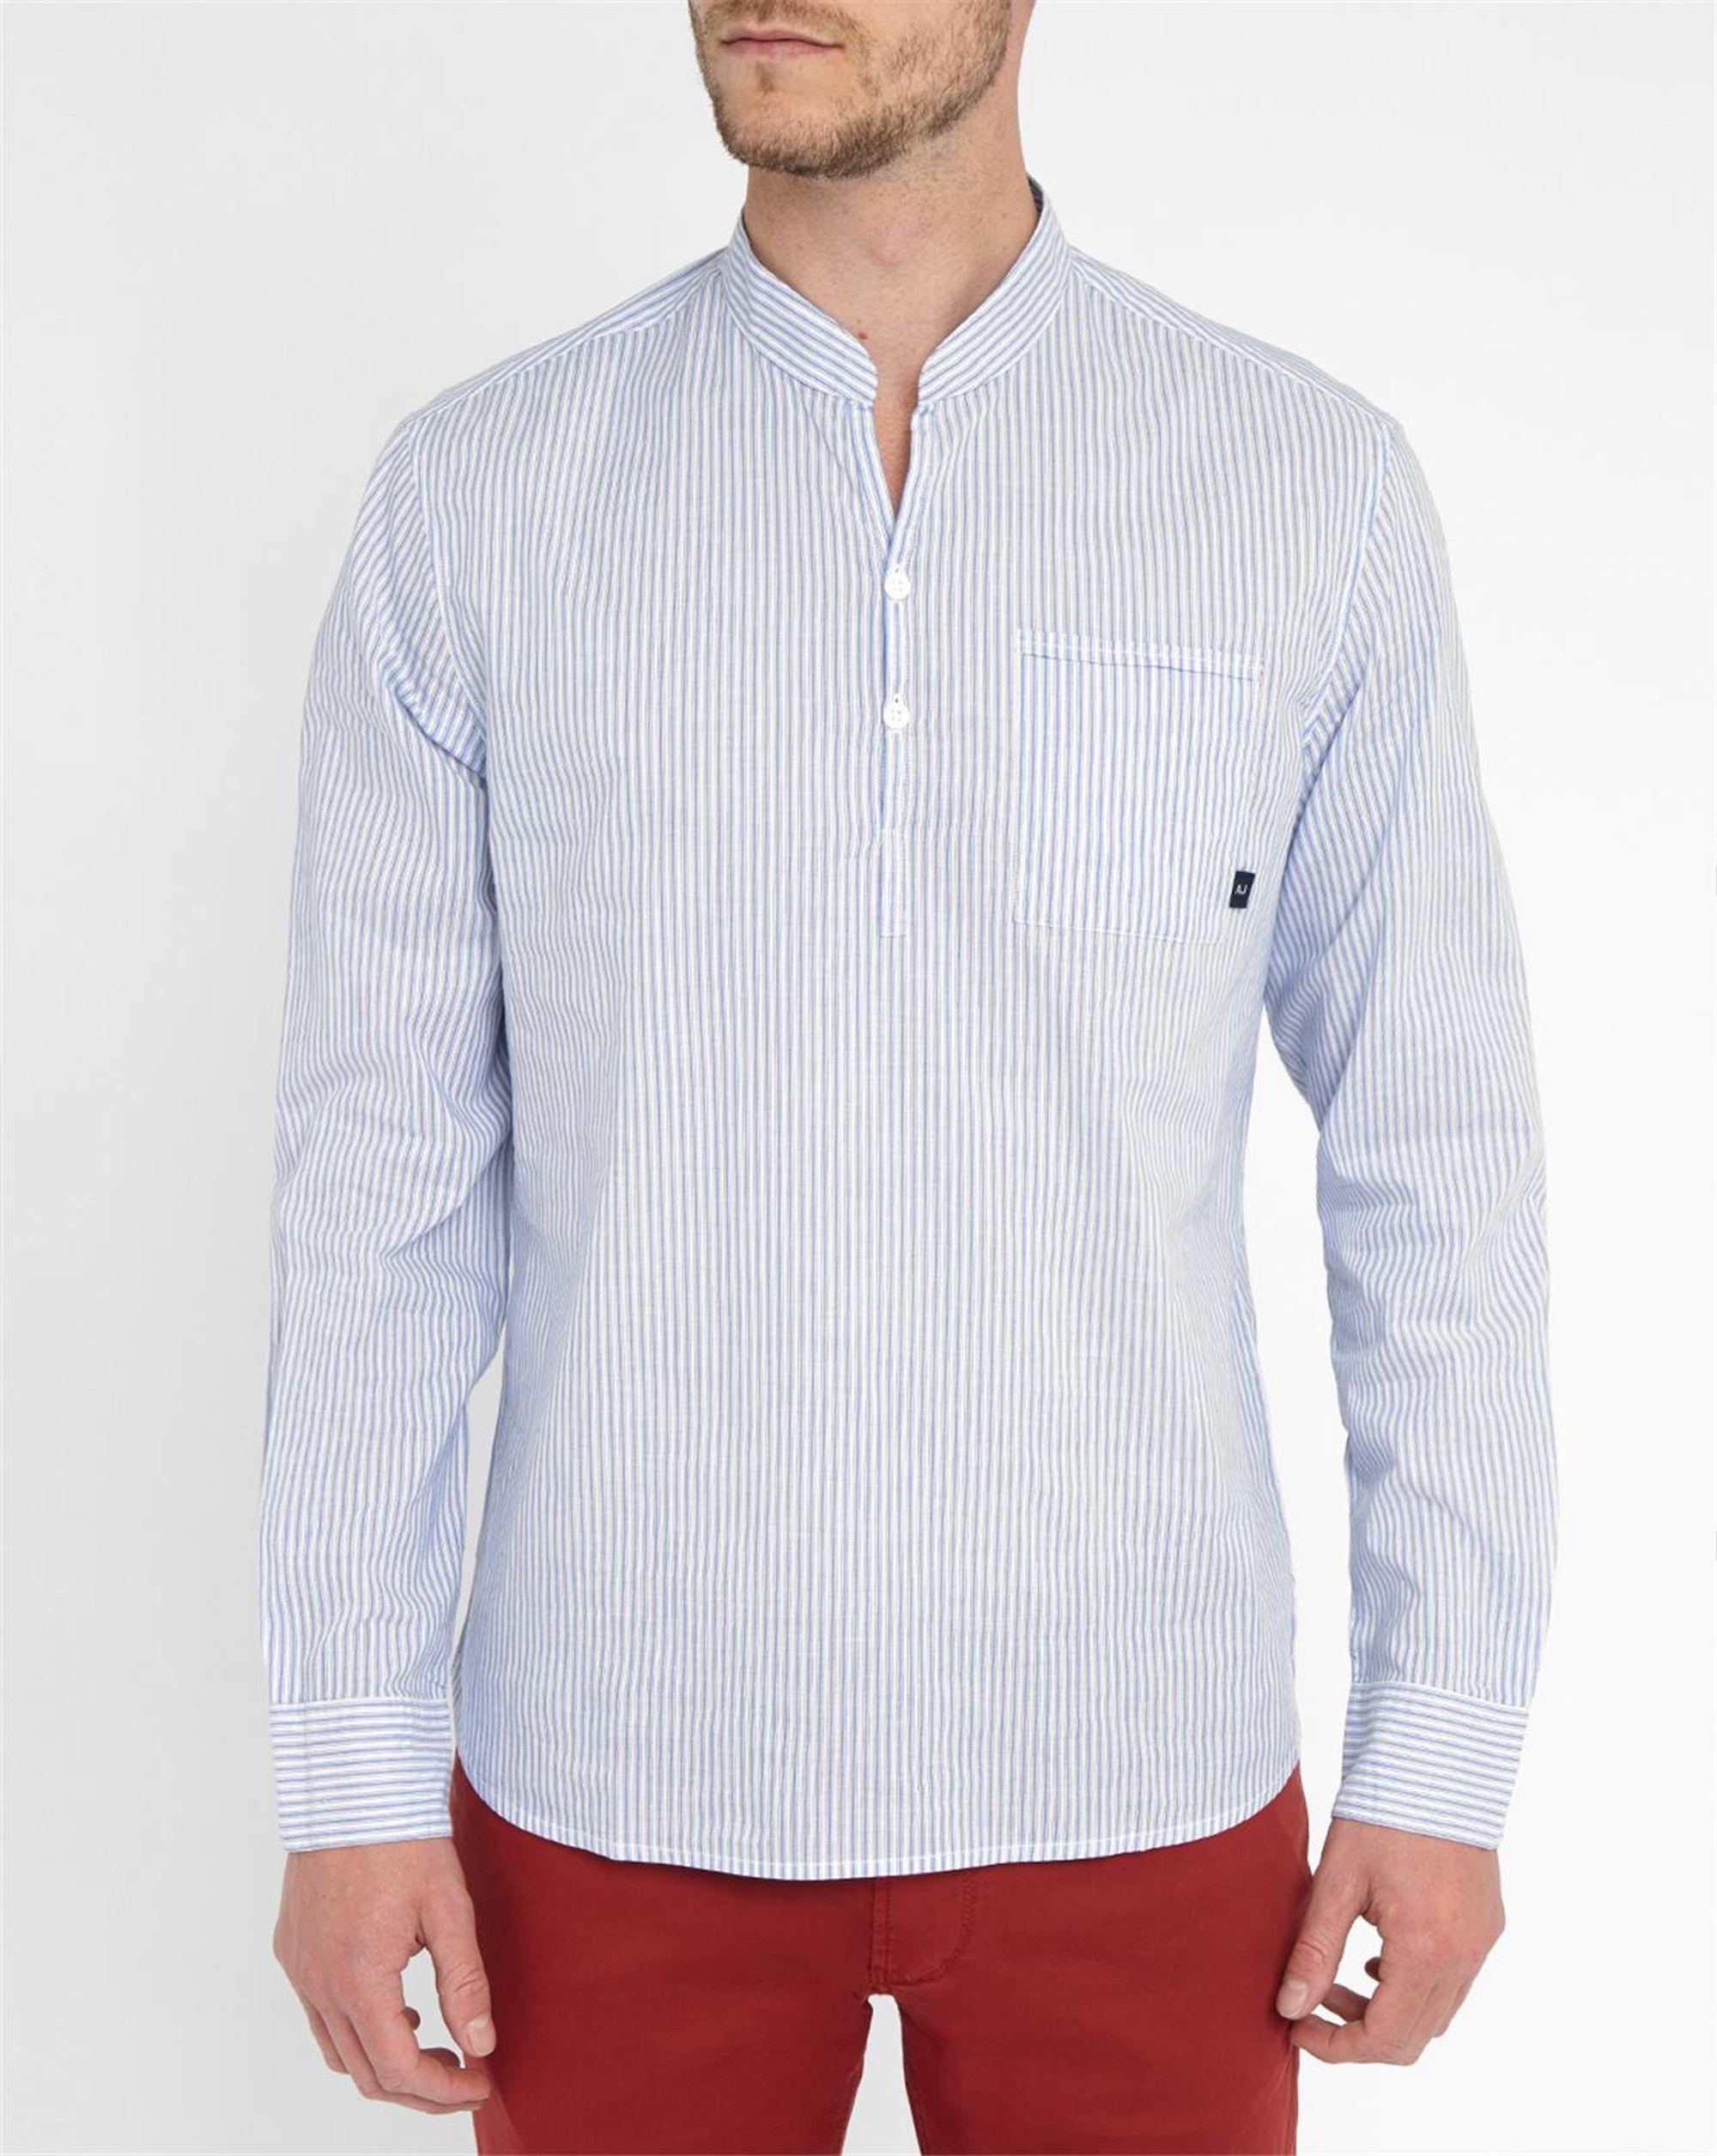 Armani jeans sky blue and white grandad collar shirt in Mens grandad collar shirt